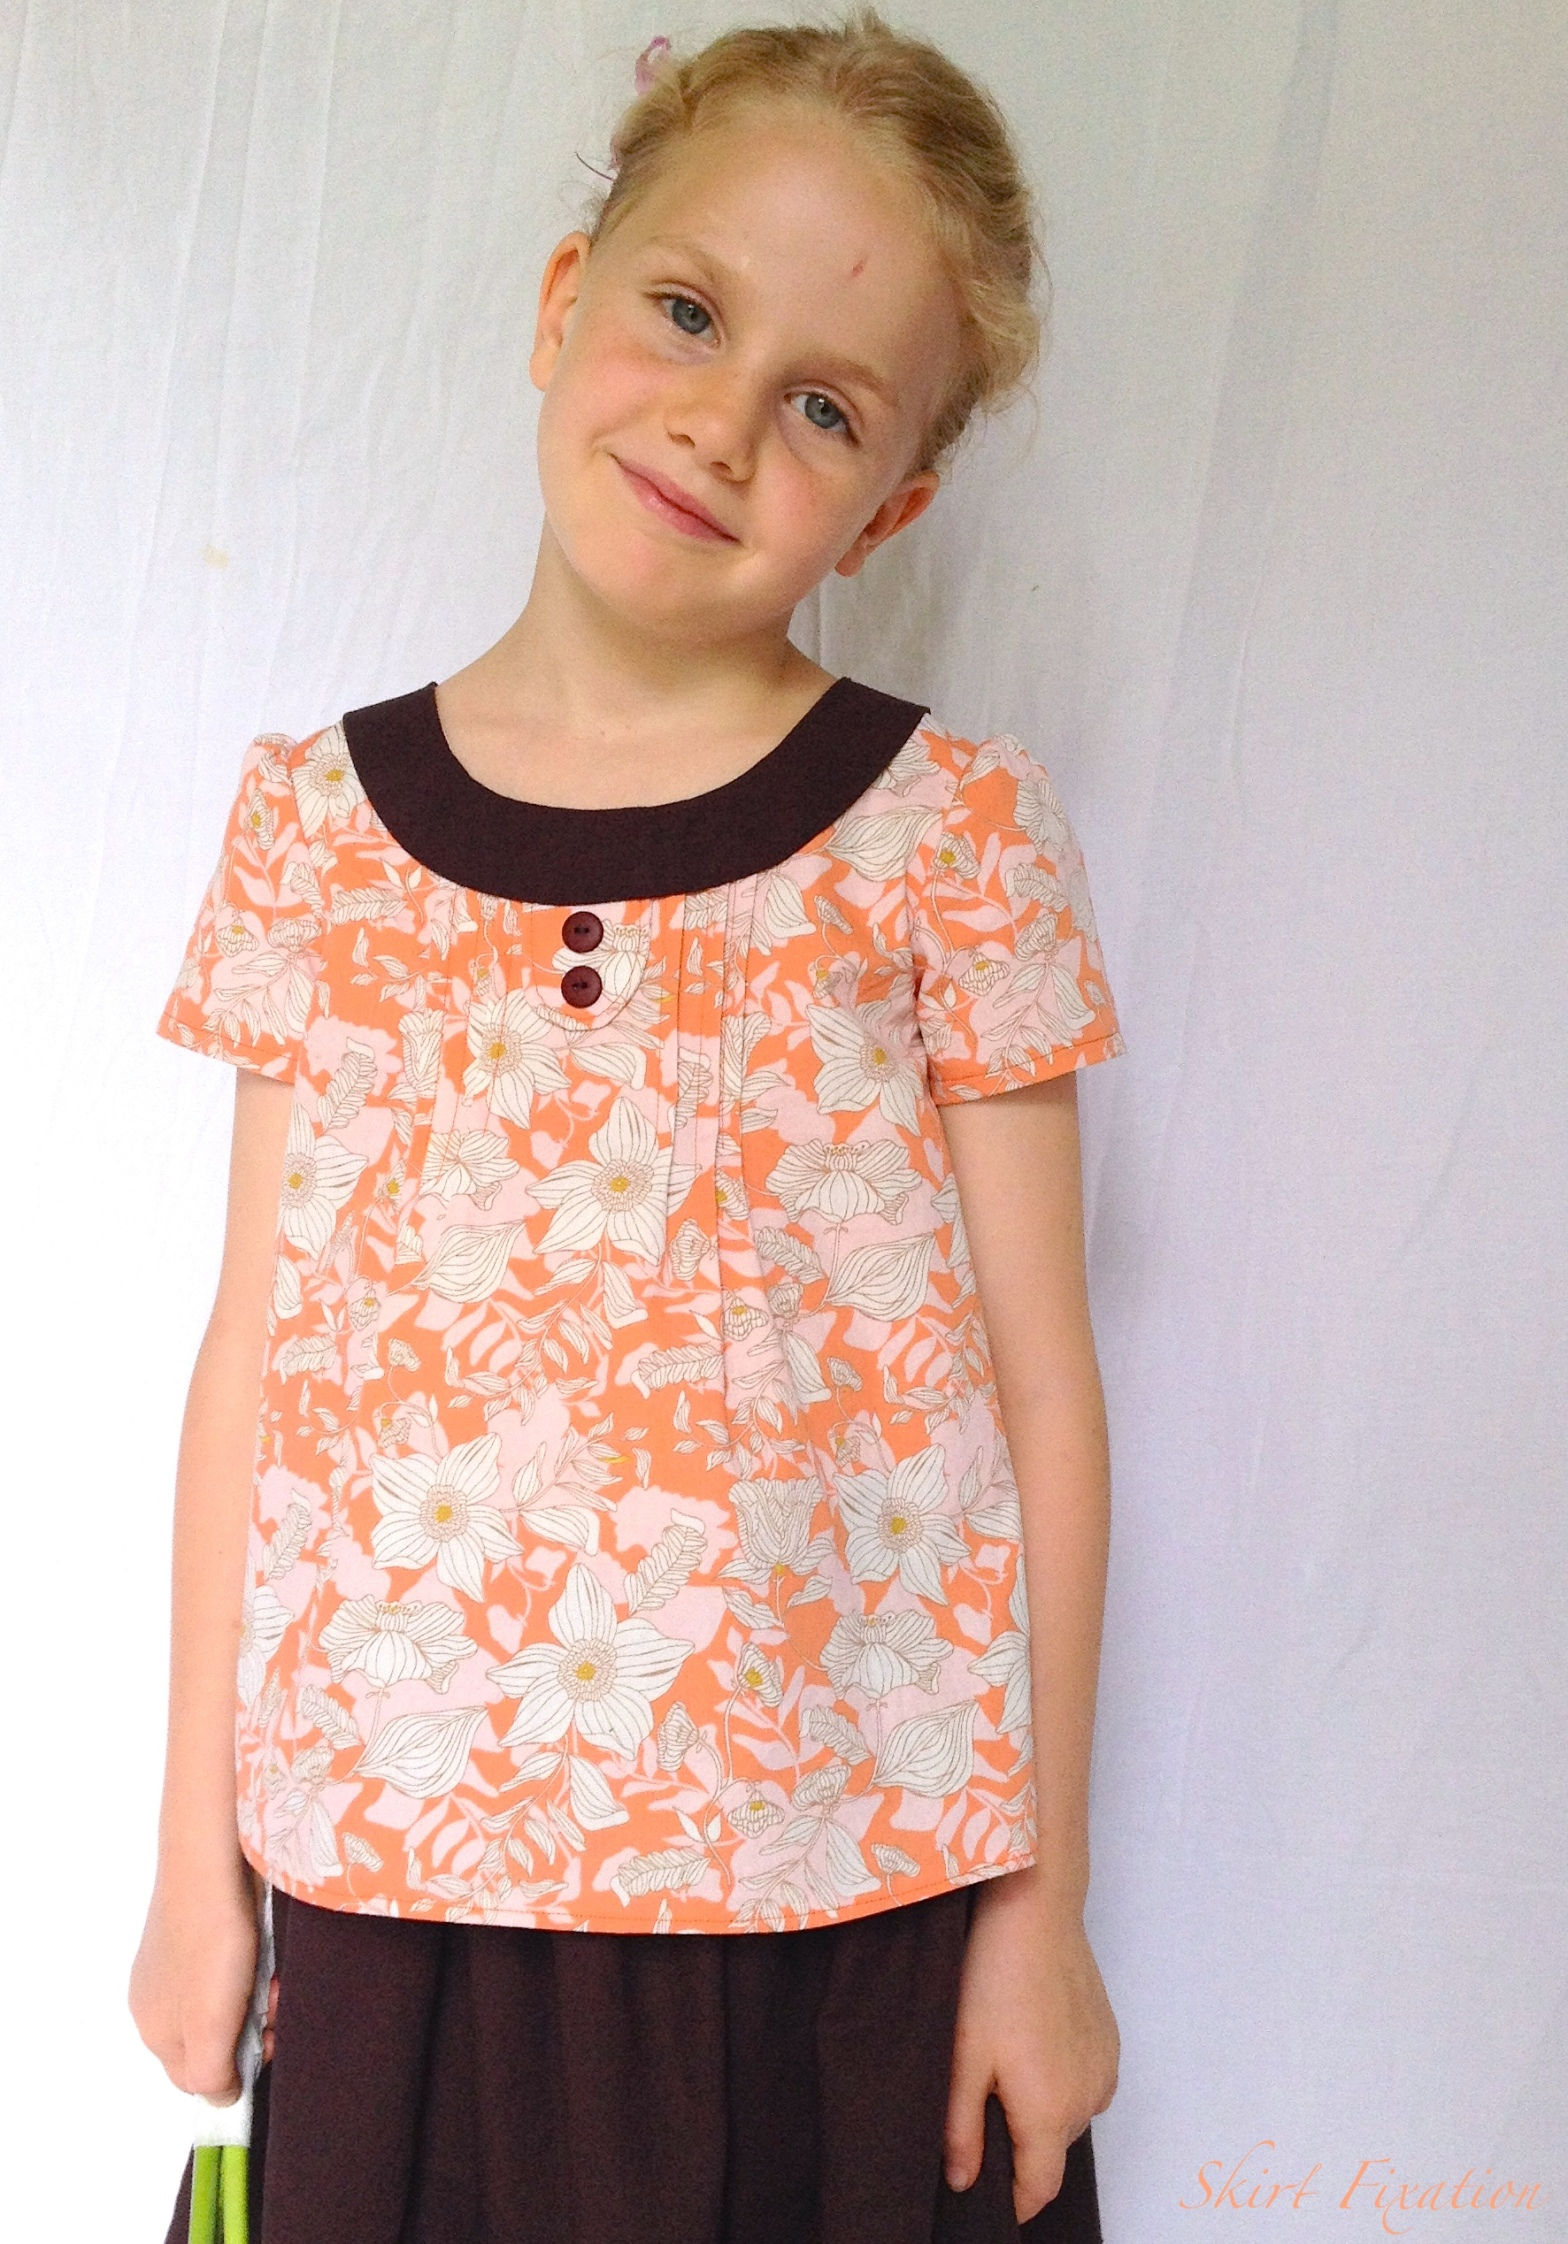 Skirt Fixation for Bonnie Christine's Cultivate blog tour